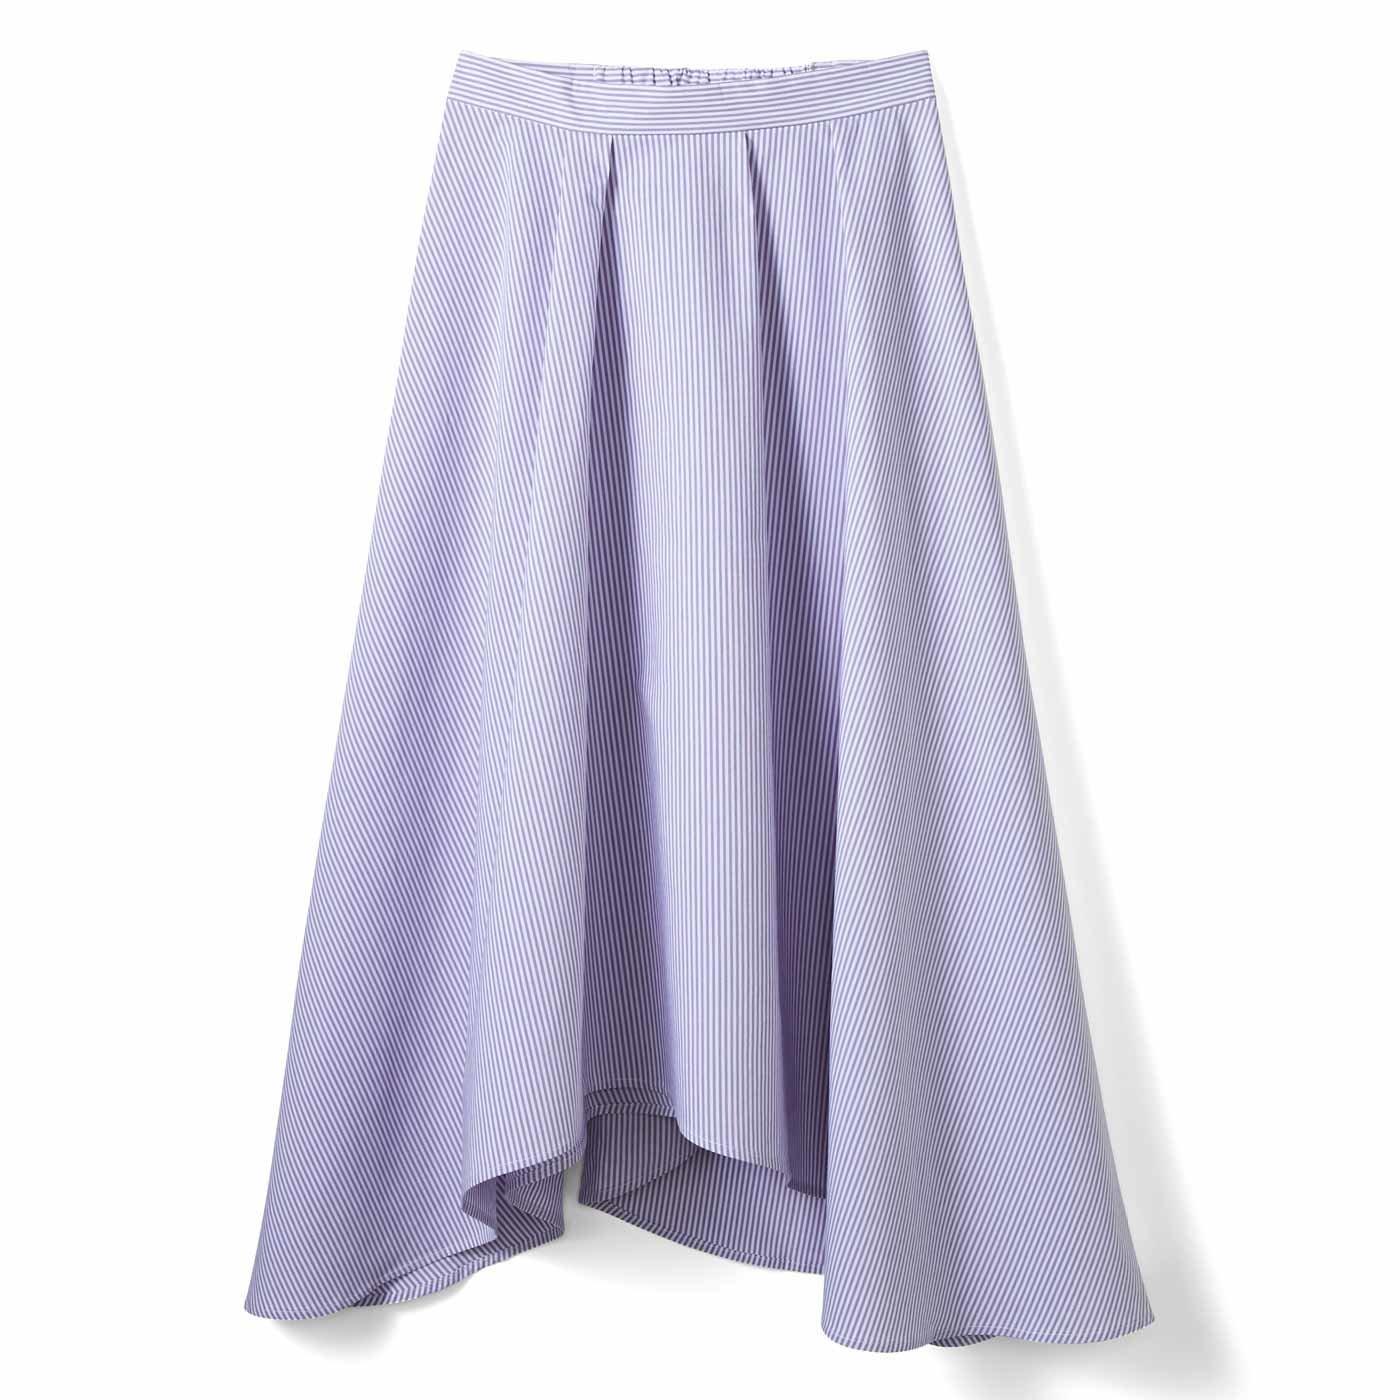 IEDIT[イディット] ストライプイレギュラーヘムスカート〈パープル〉